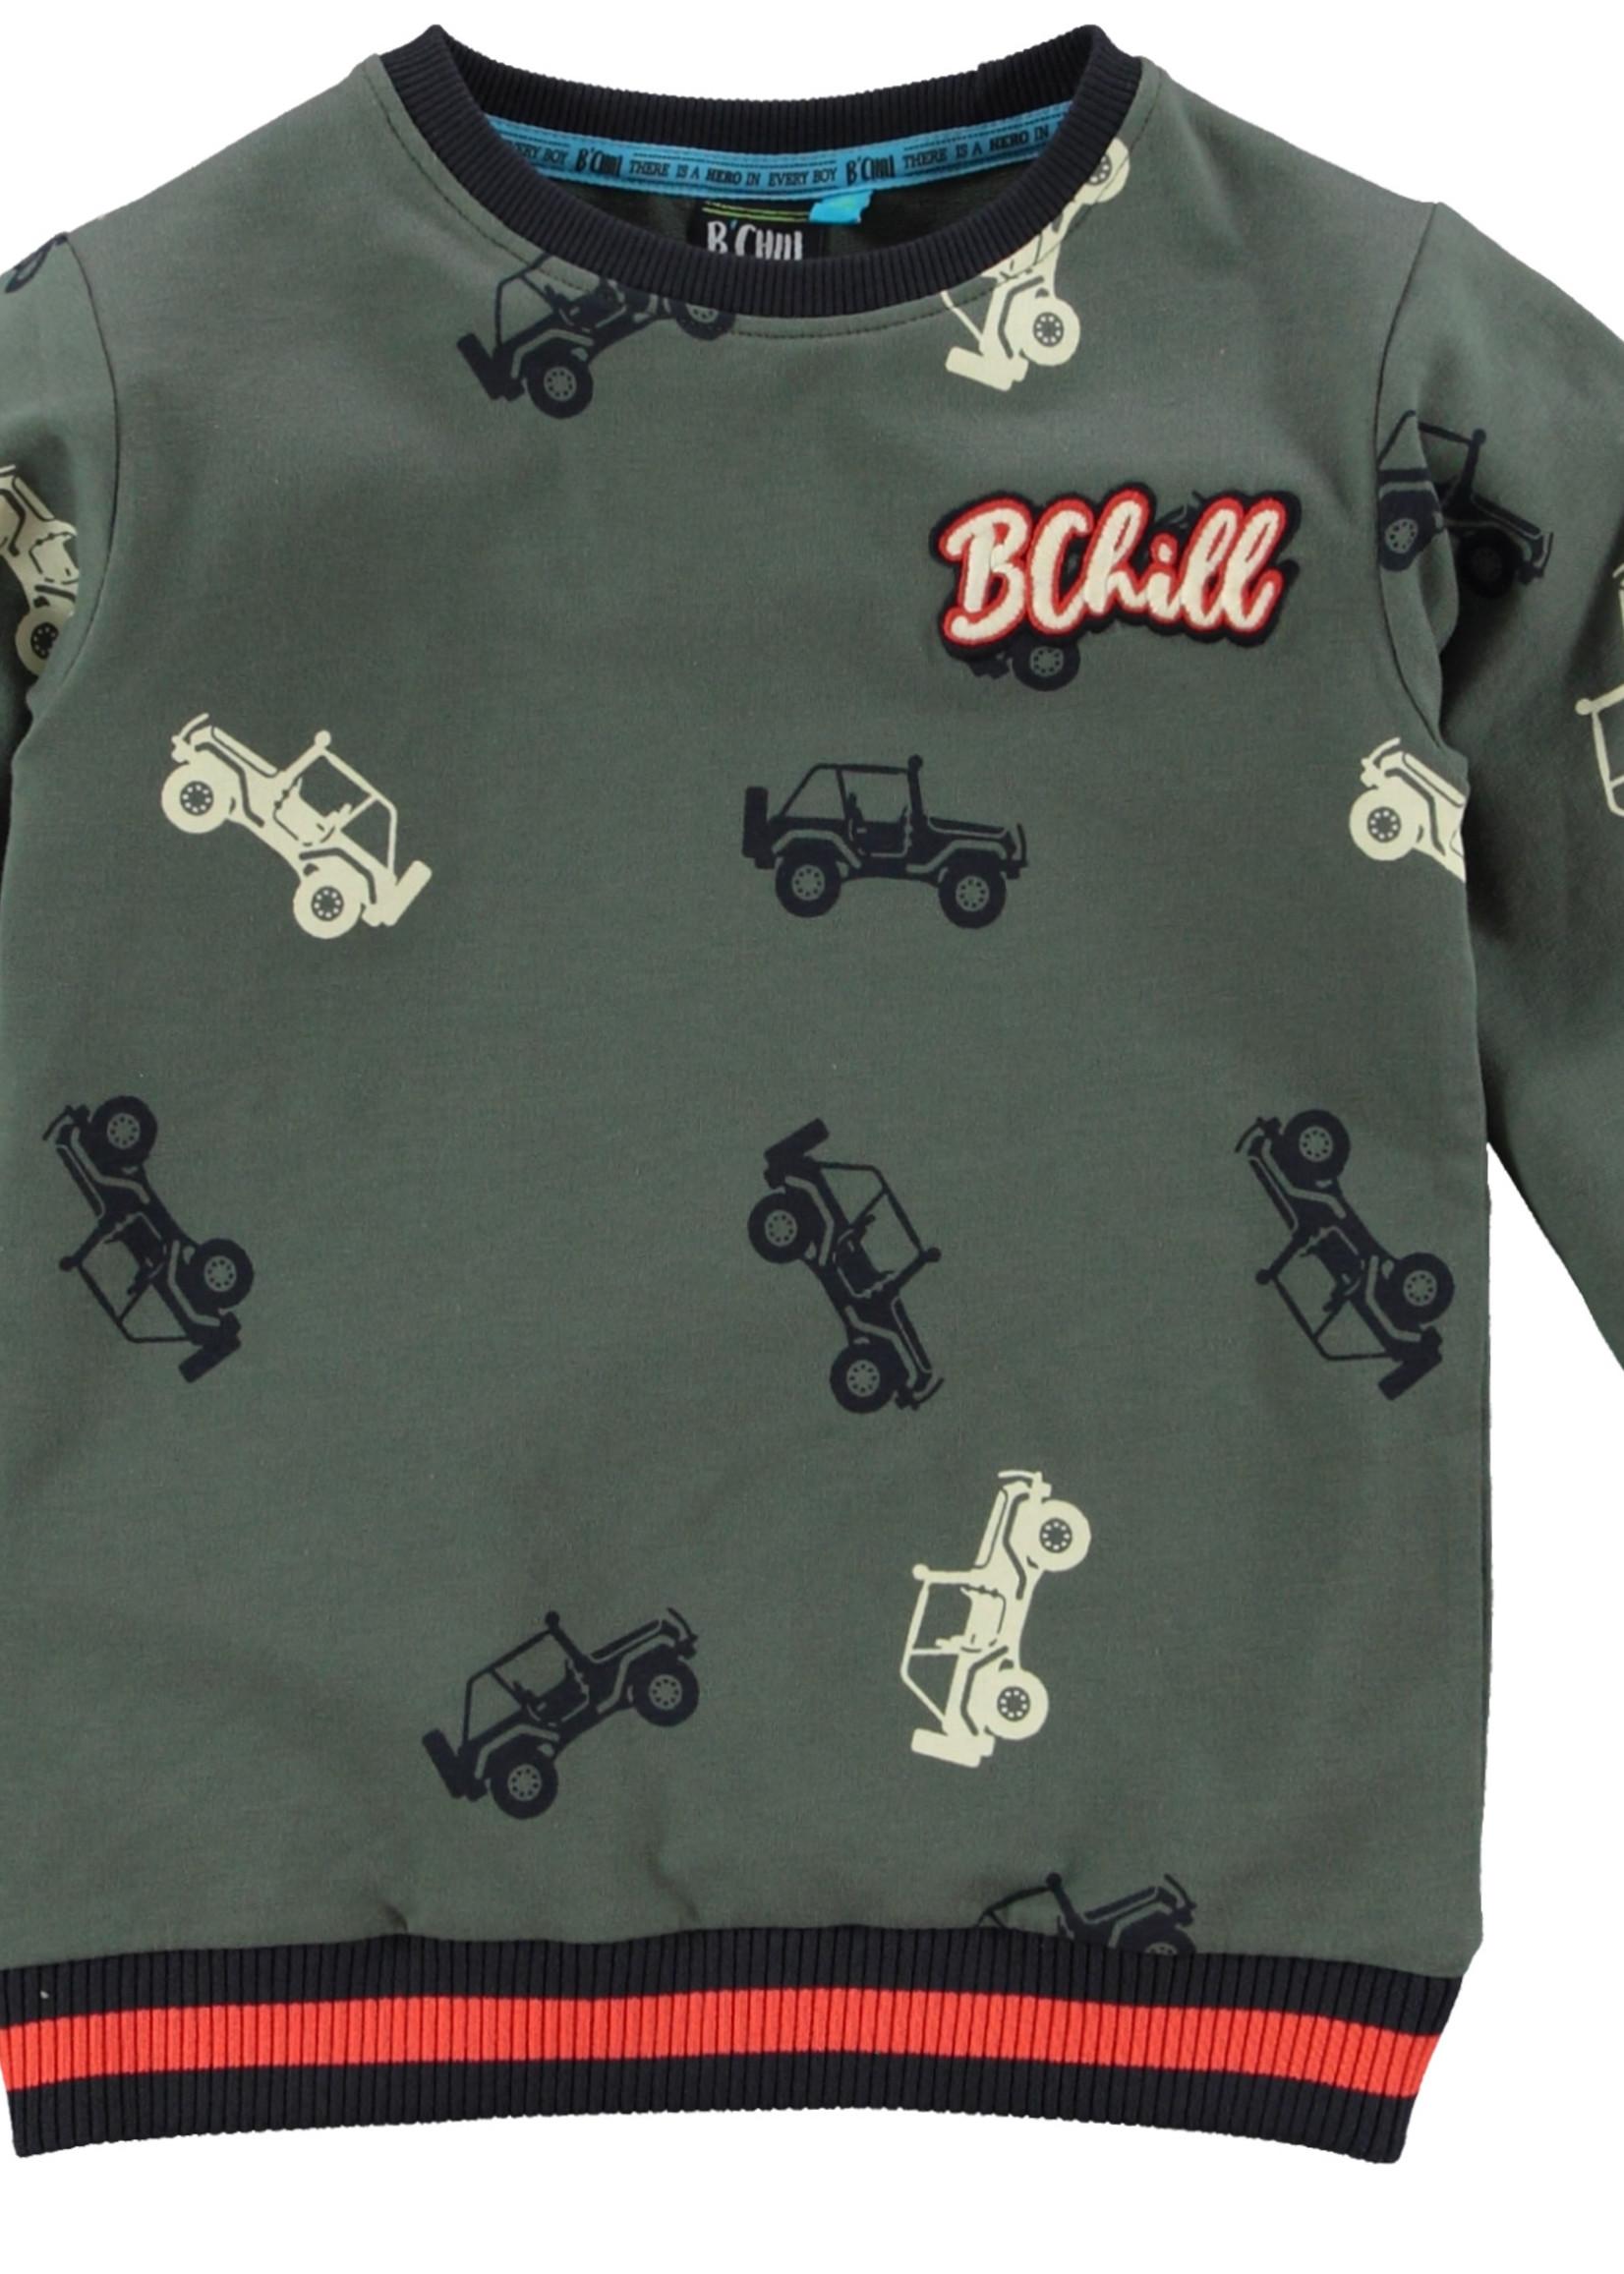 B'chill Marc sweater